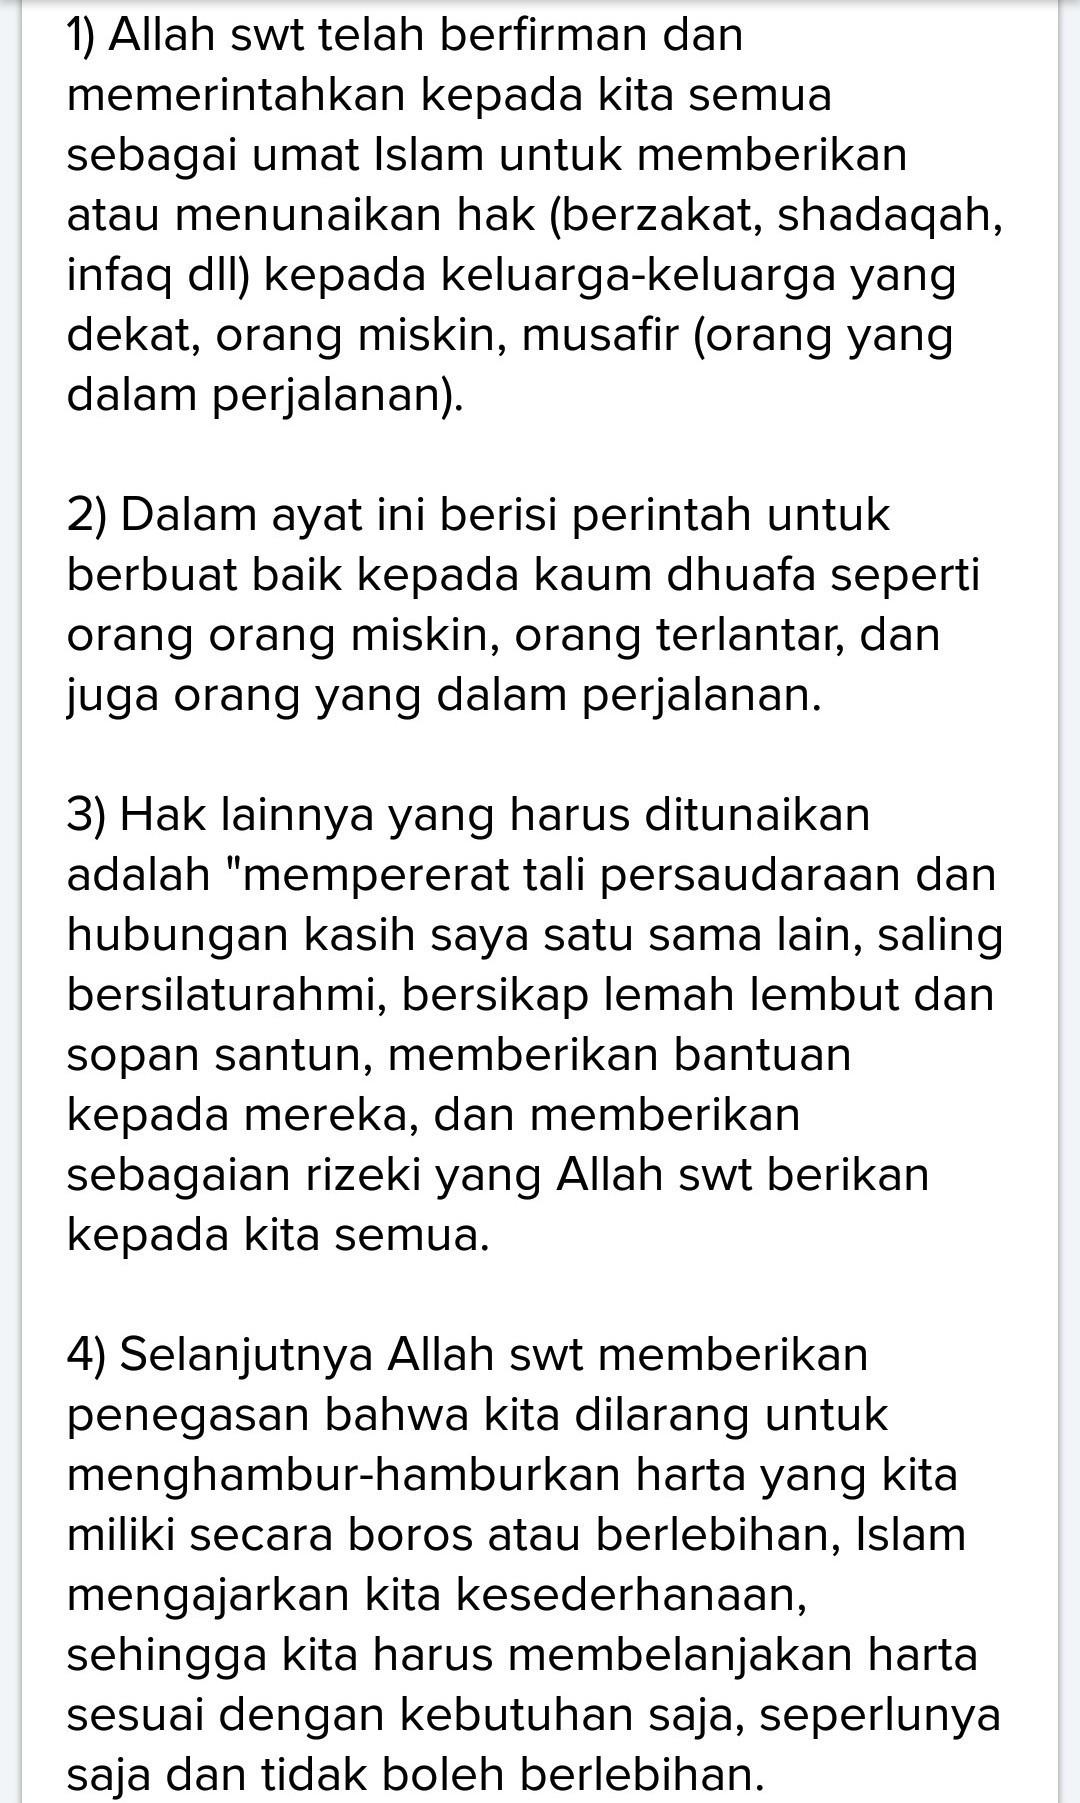 Al Isra Ayat 26-27 : 26-27, Kandungan, Isra/17:26-27, Brainly.co.id